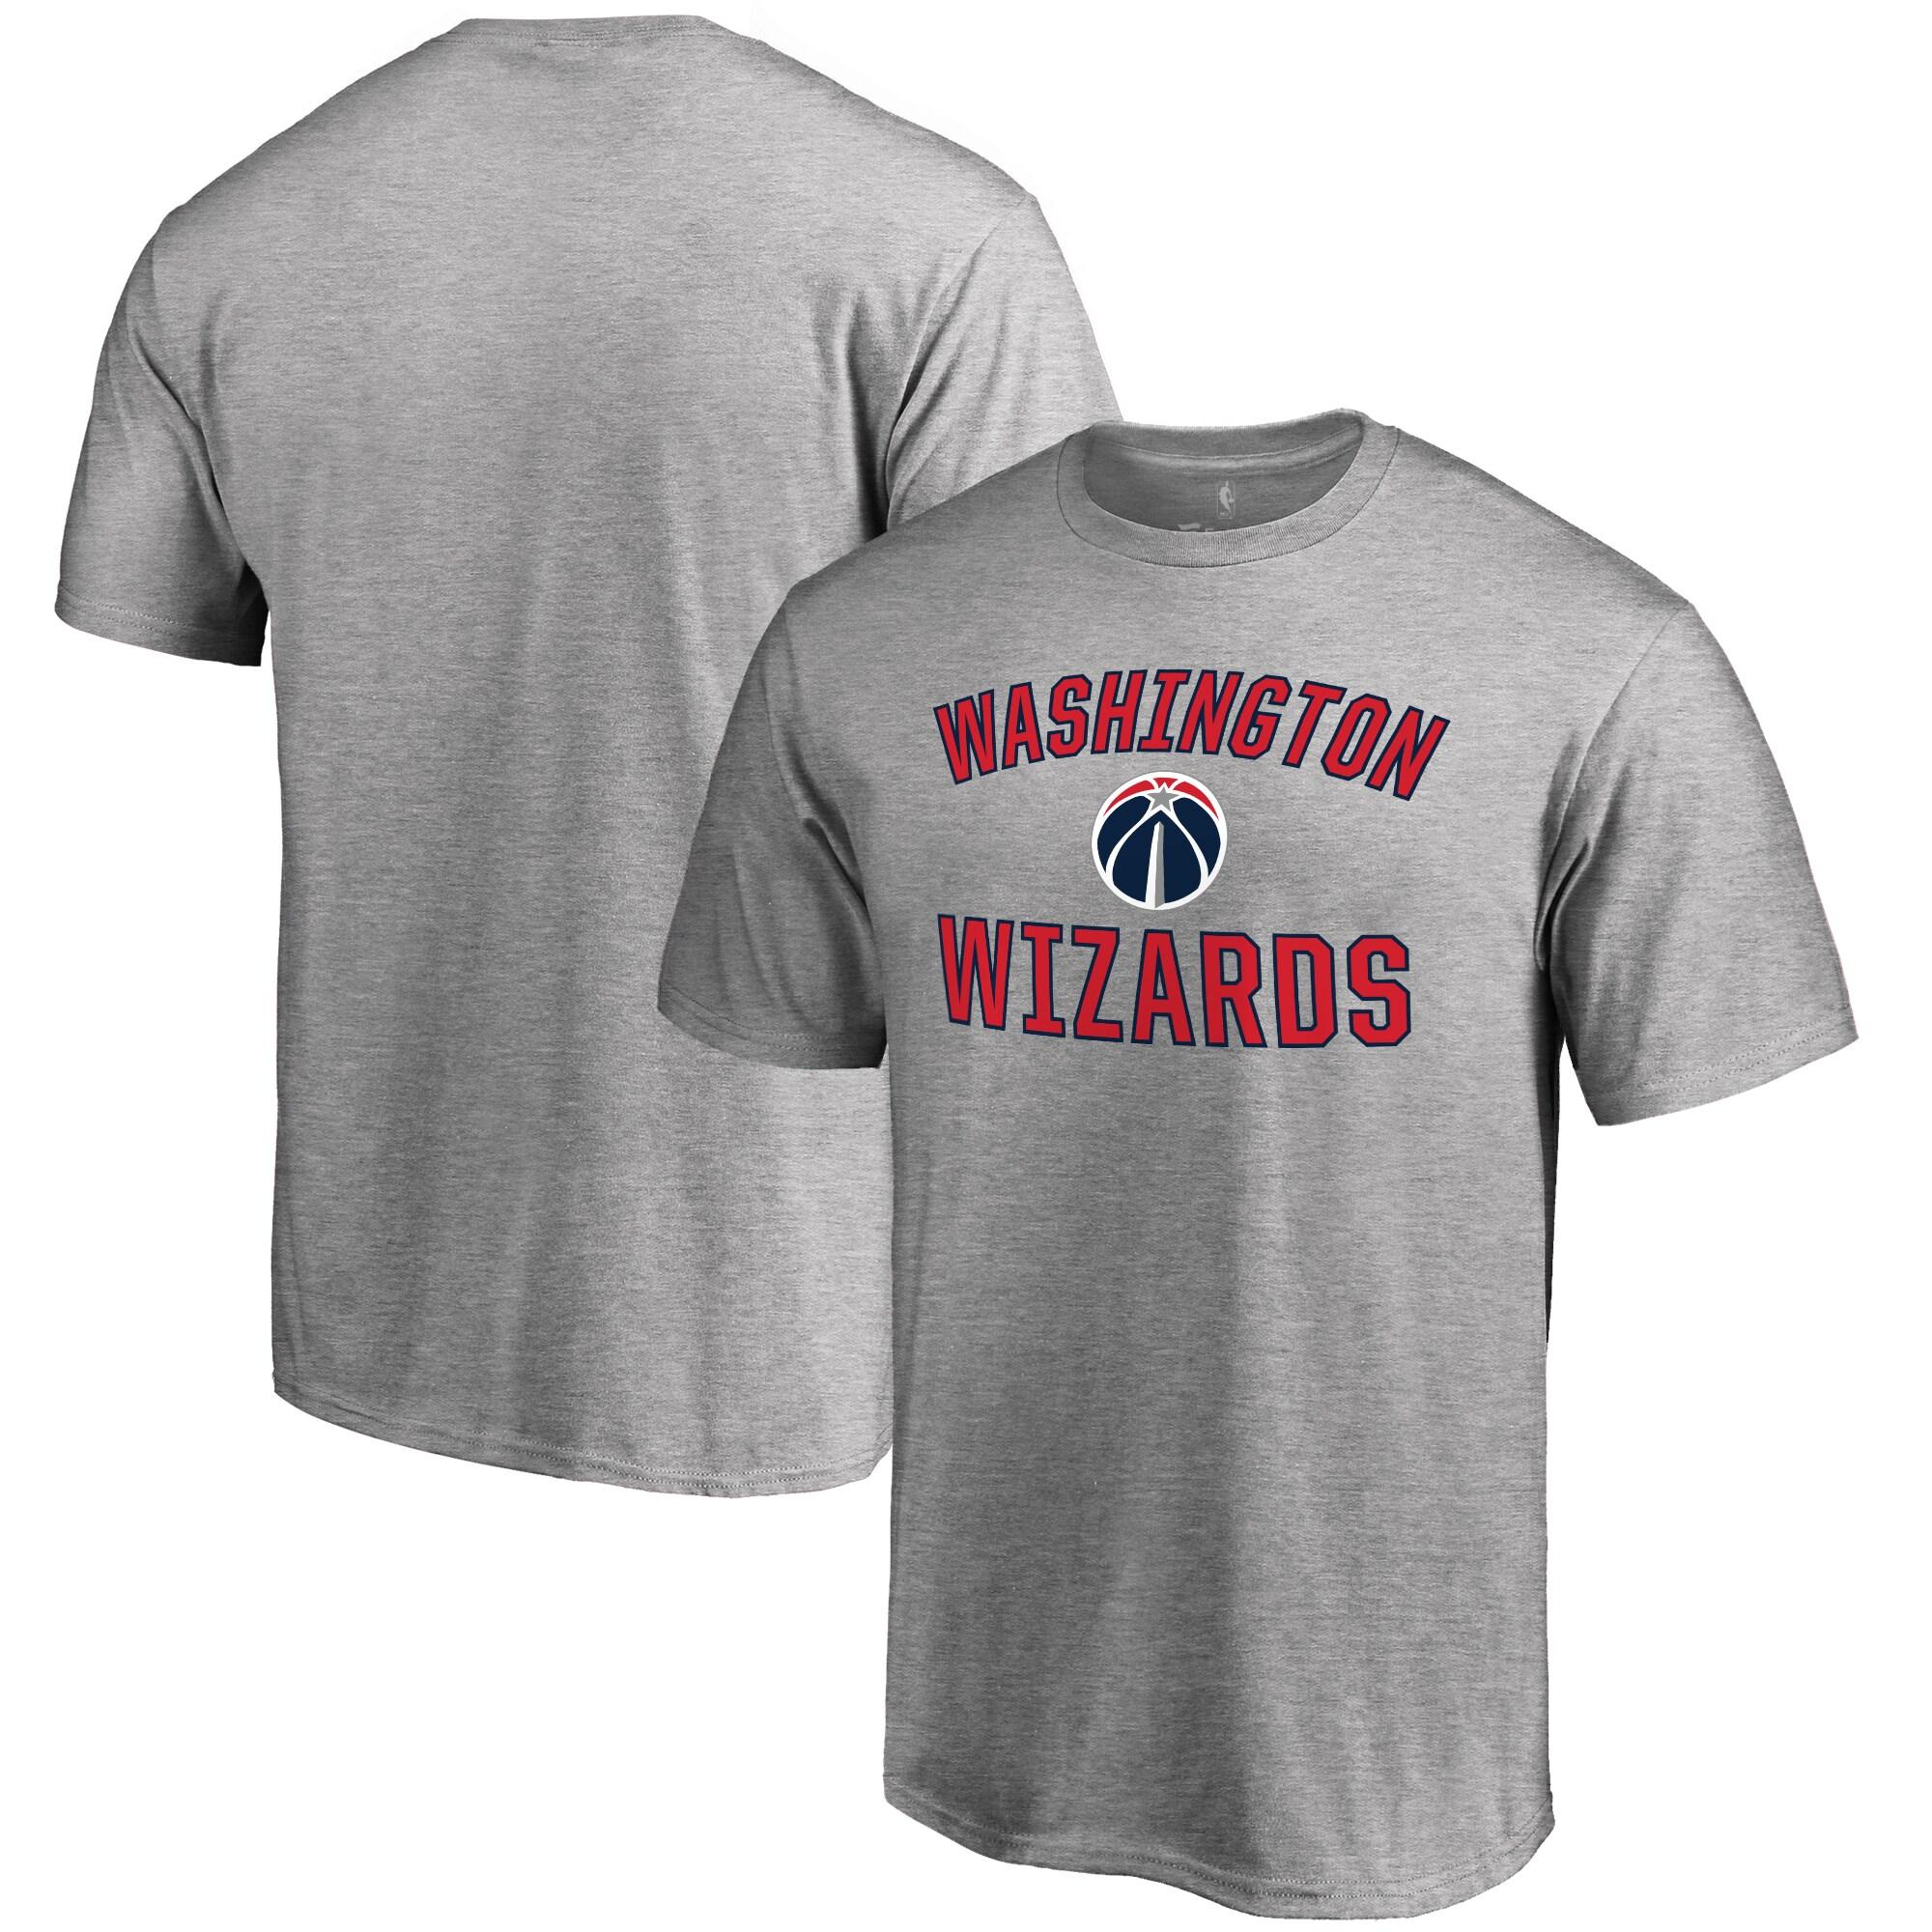 Washington Wizards Big & Tall Victory Arch T-Shirt - Ash